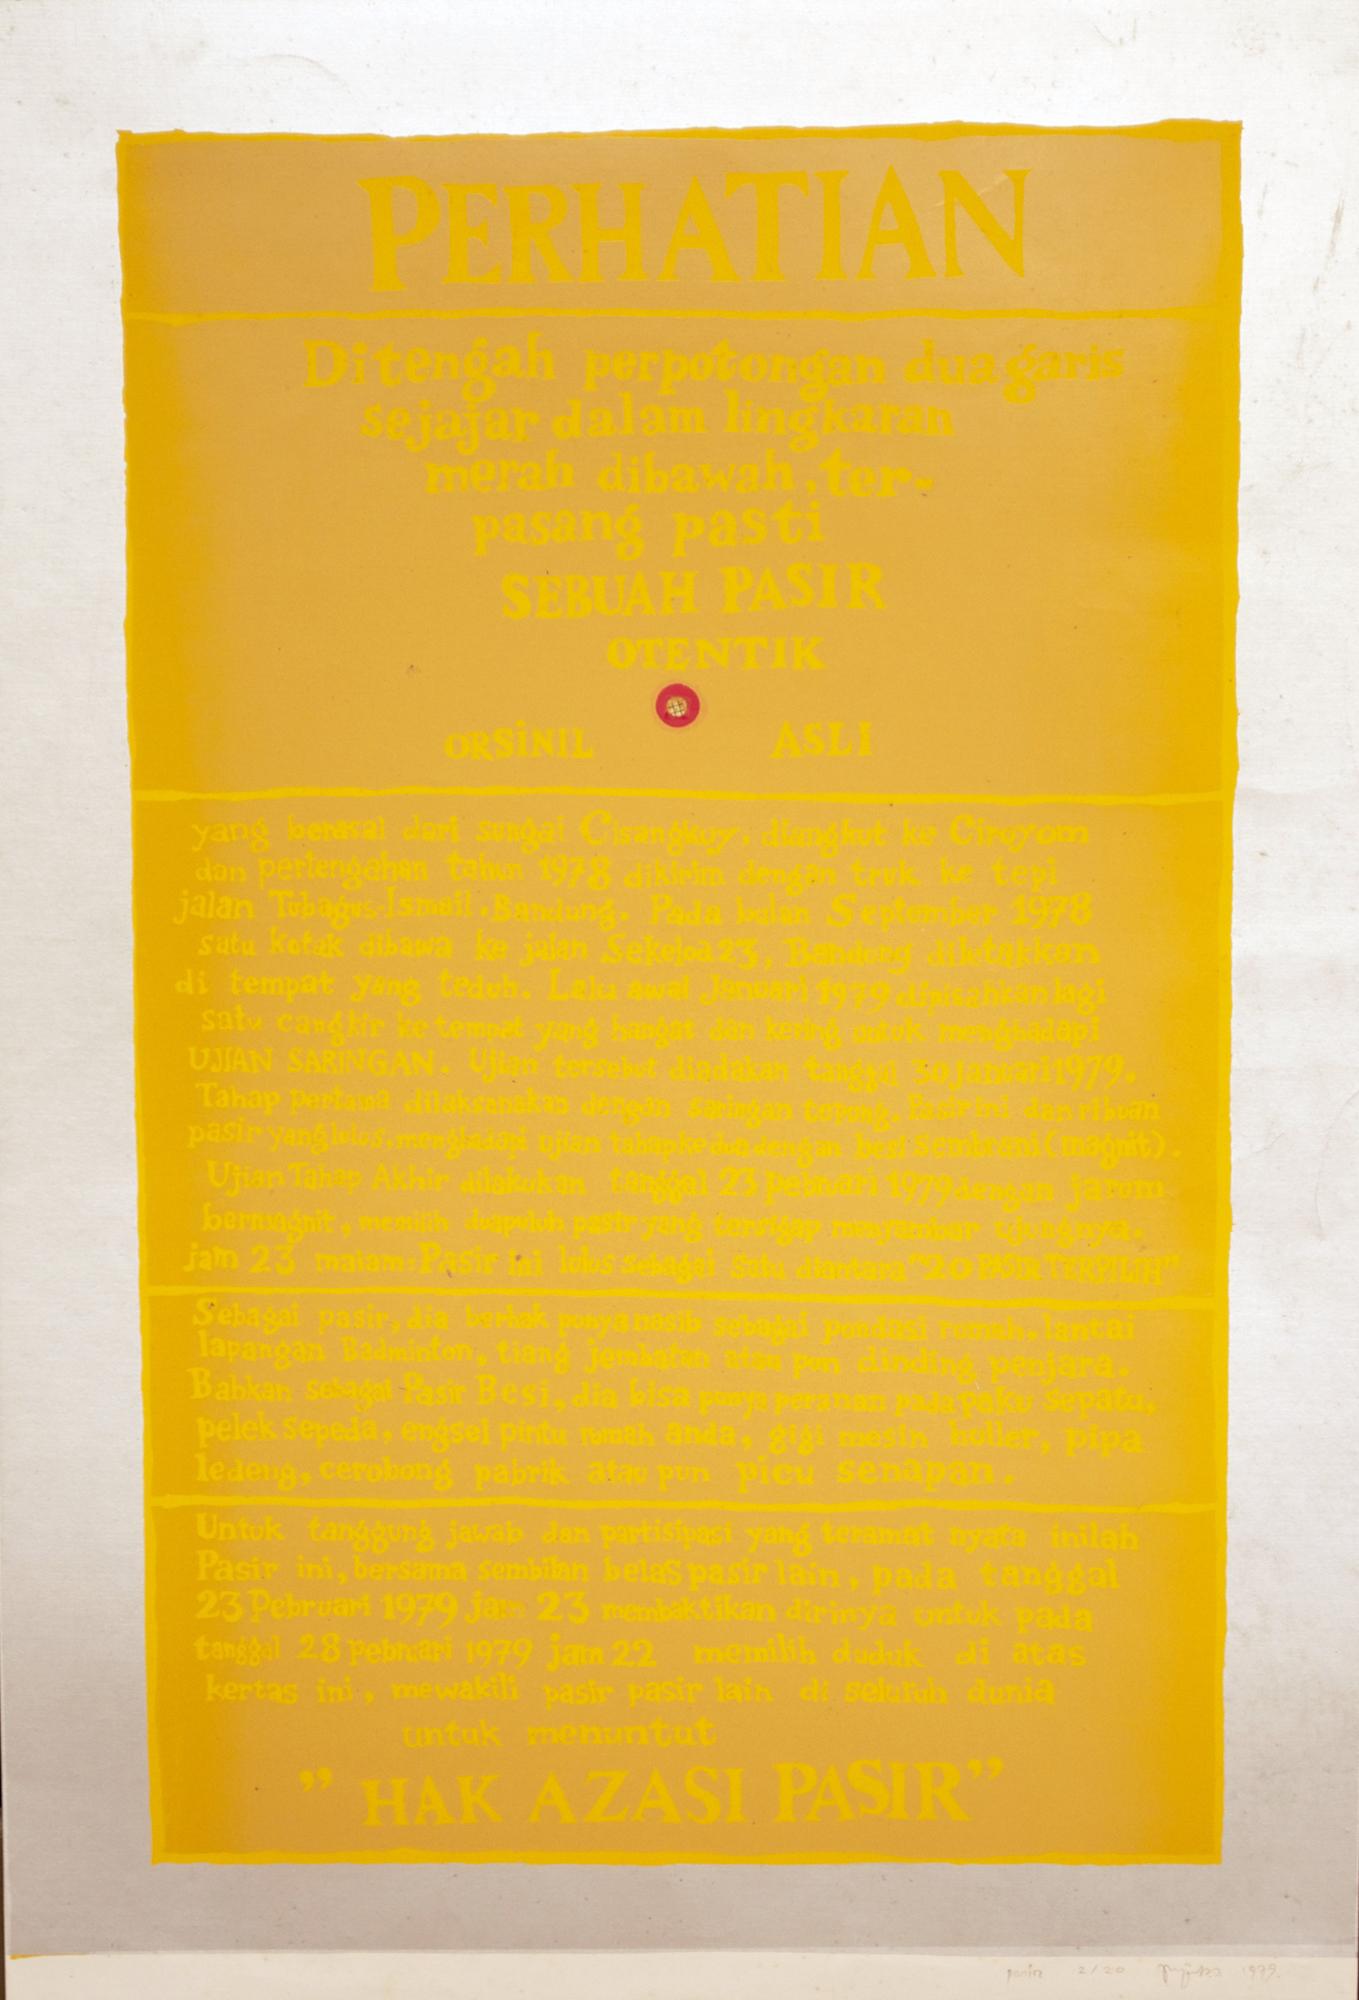 Priyanto Sunarto, Hak Azasi Pasir, cetak saring, 50 x 25 cm, edisi: 2/20, 1979.